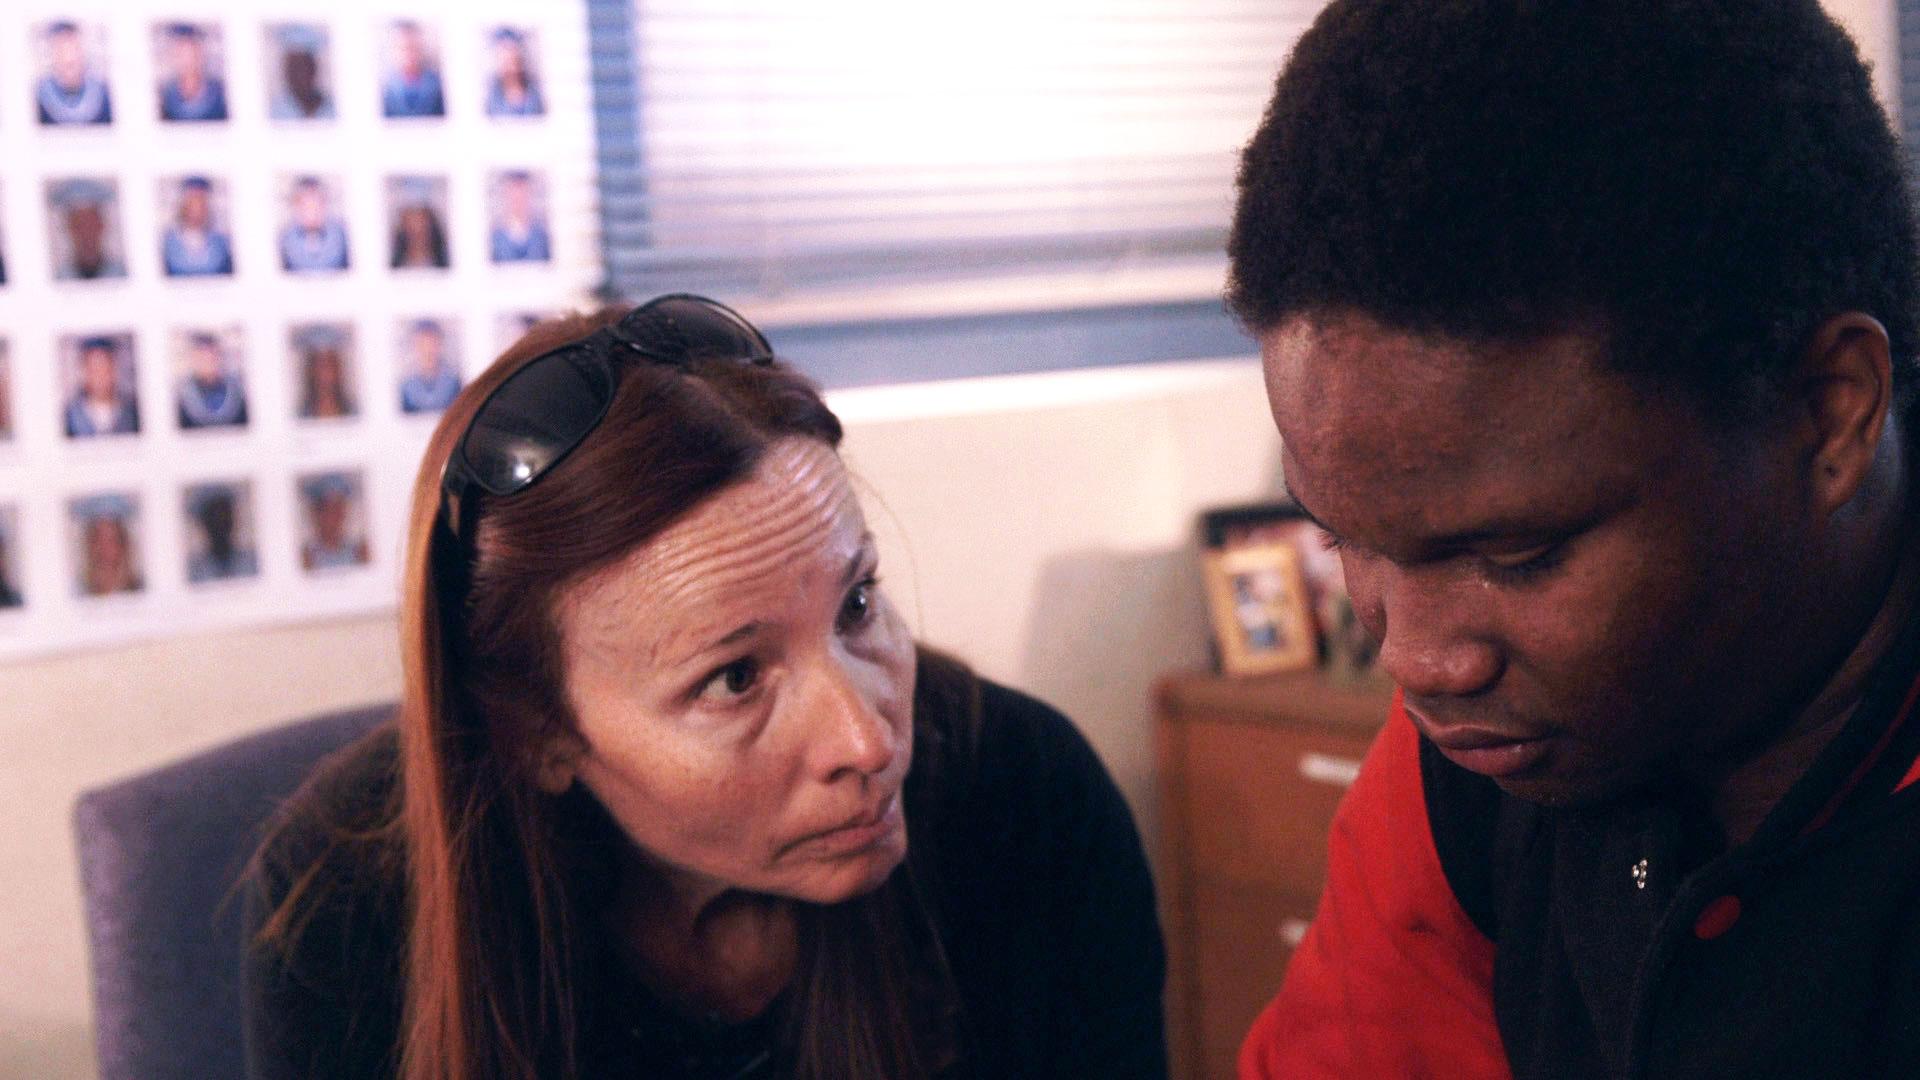 Black Rock School Principal Vonda Viland gives advice to student Lee, in The Bad Kids